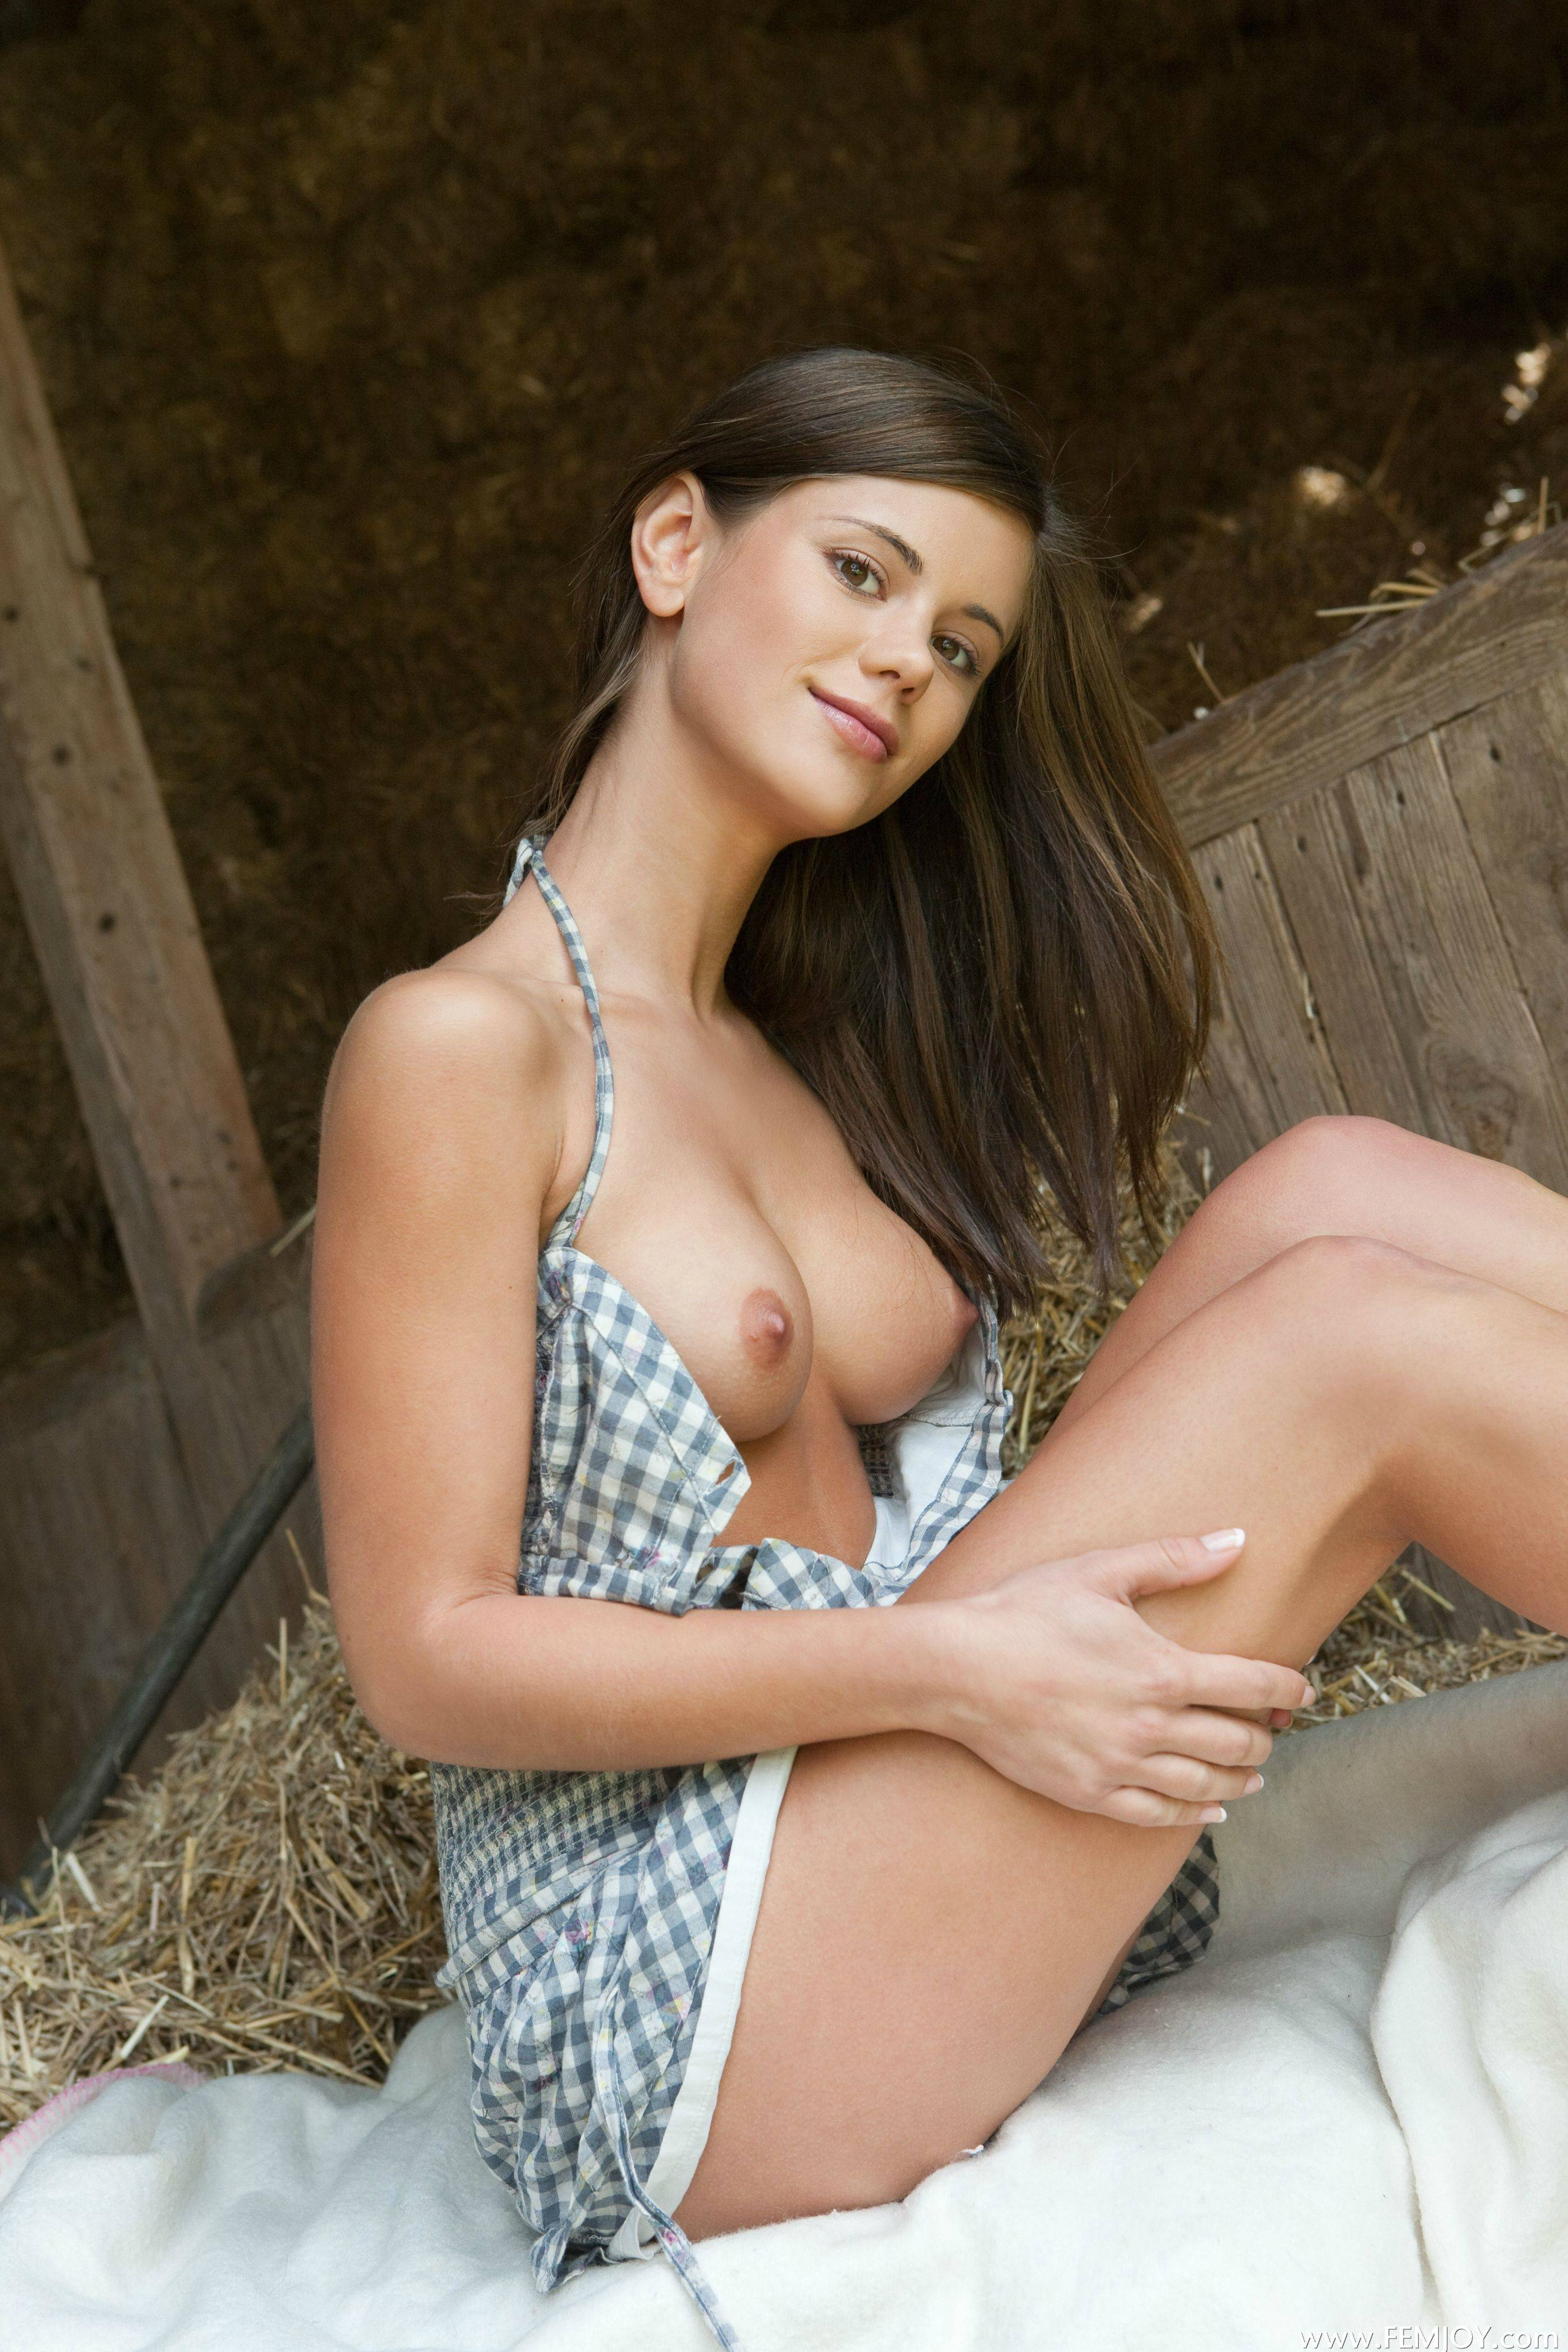 Claudia lynx hard sex